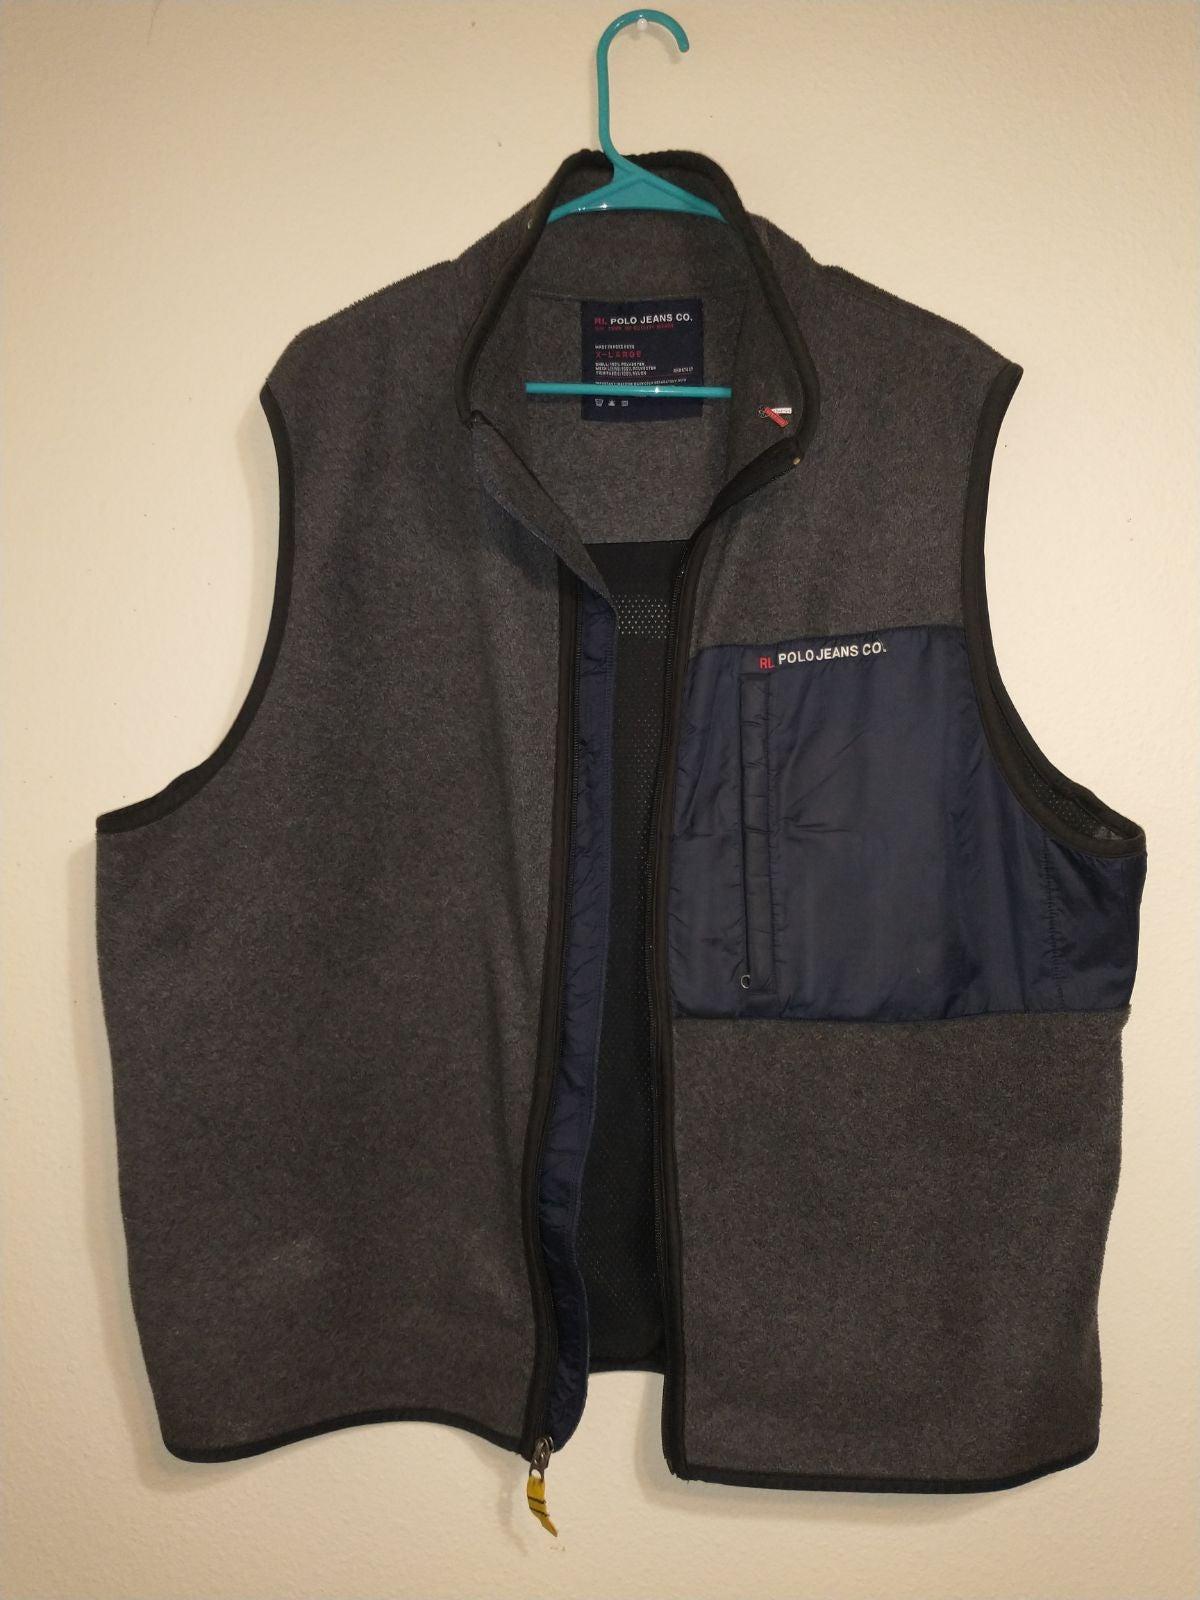 Ralph Lauren Man's Vest L